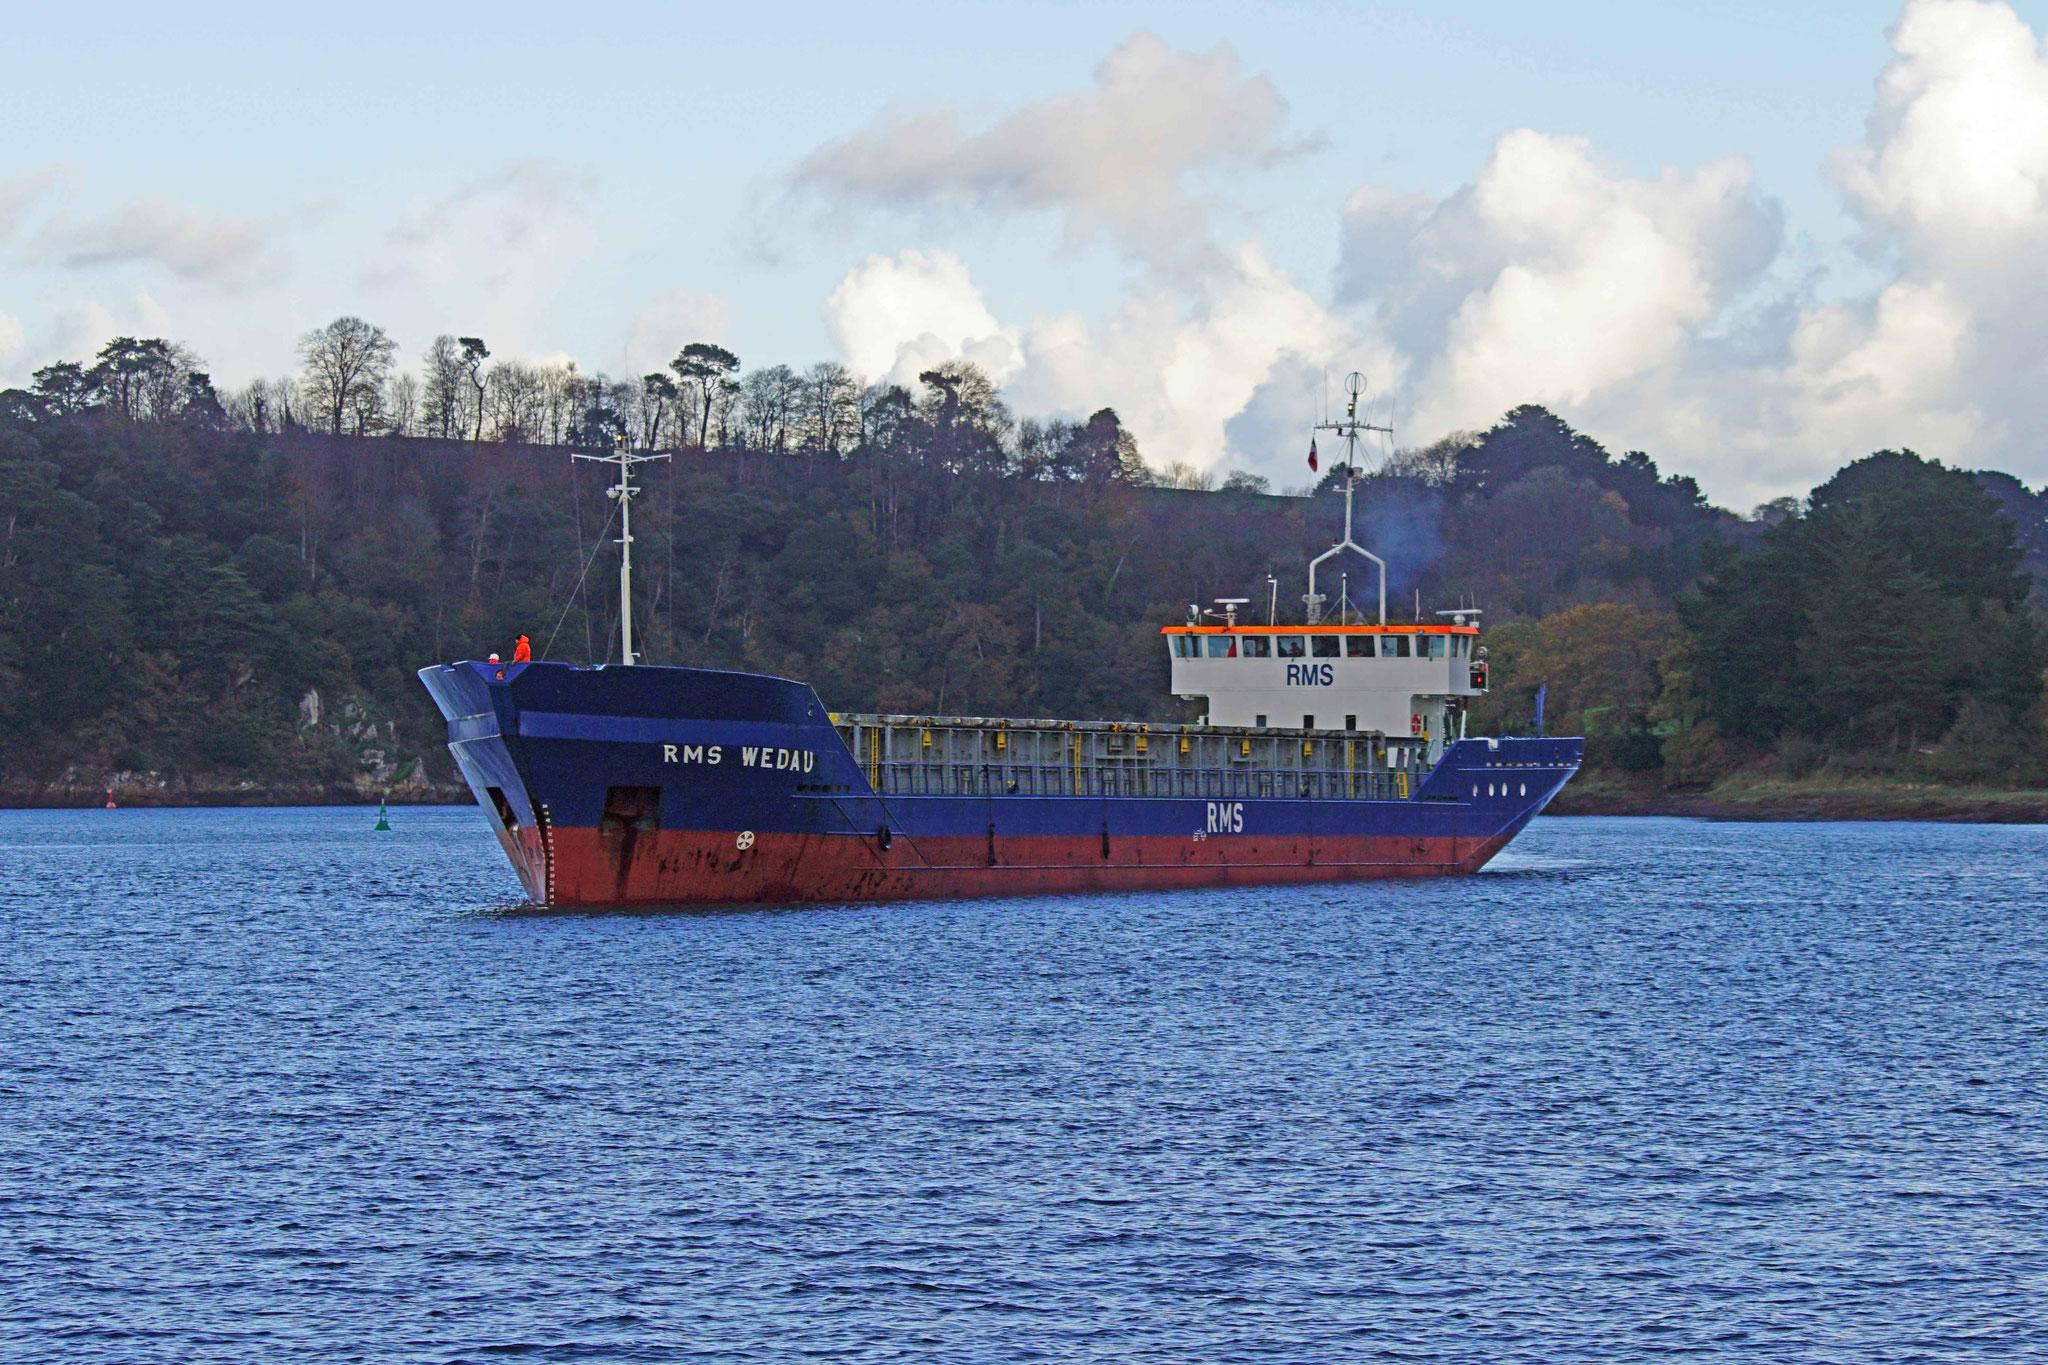 RMS Wedau, DSC03195